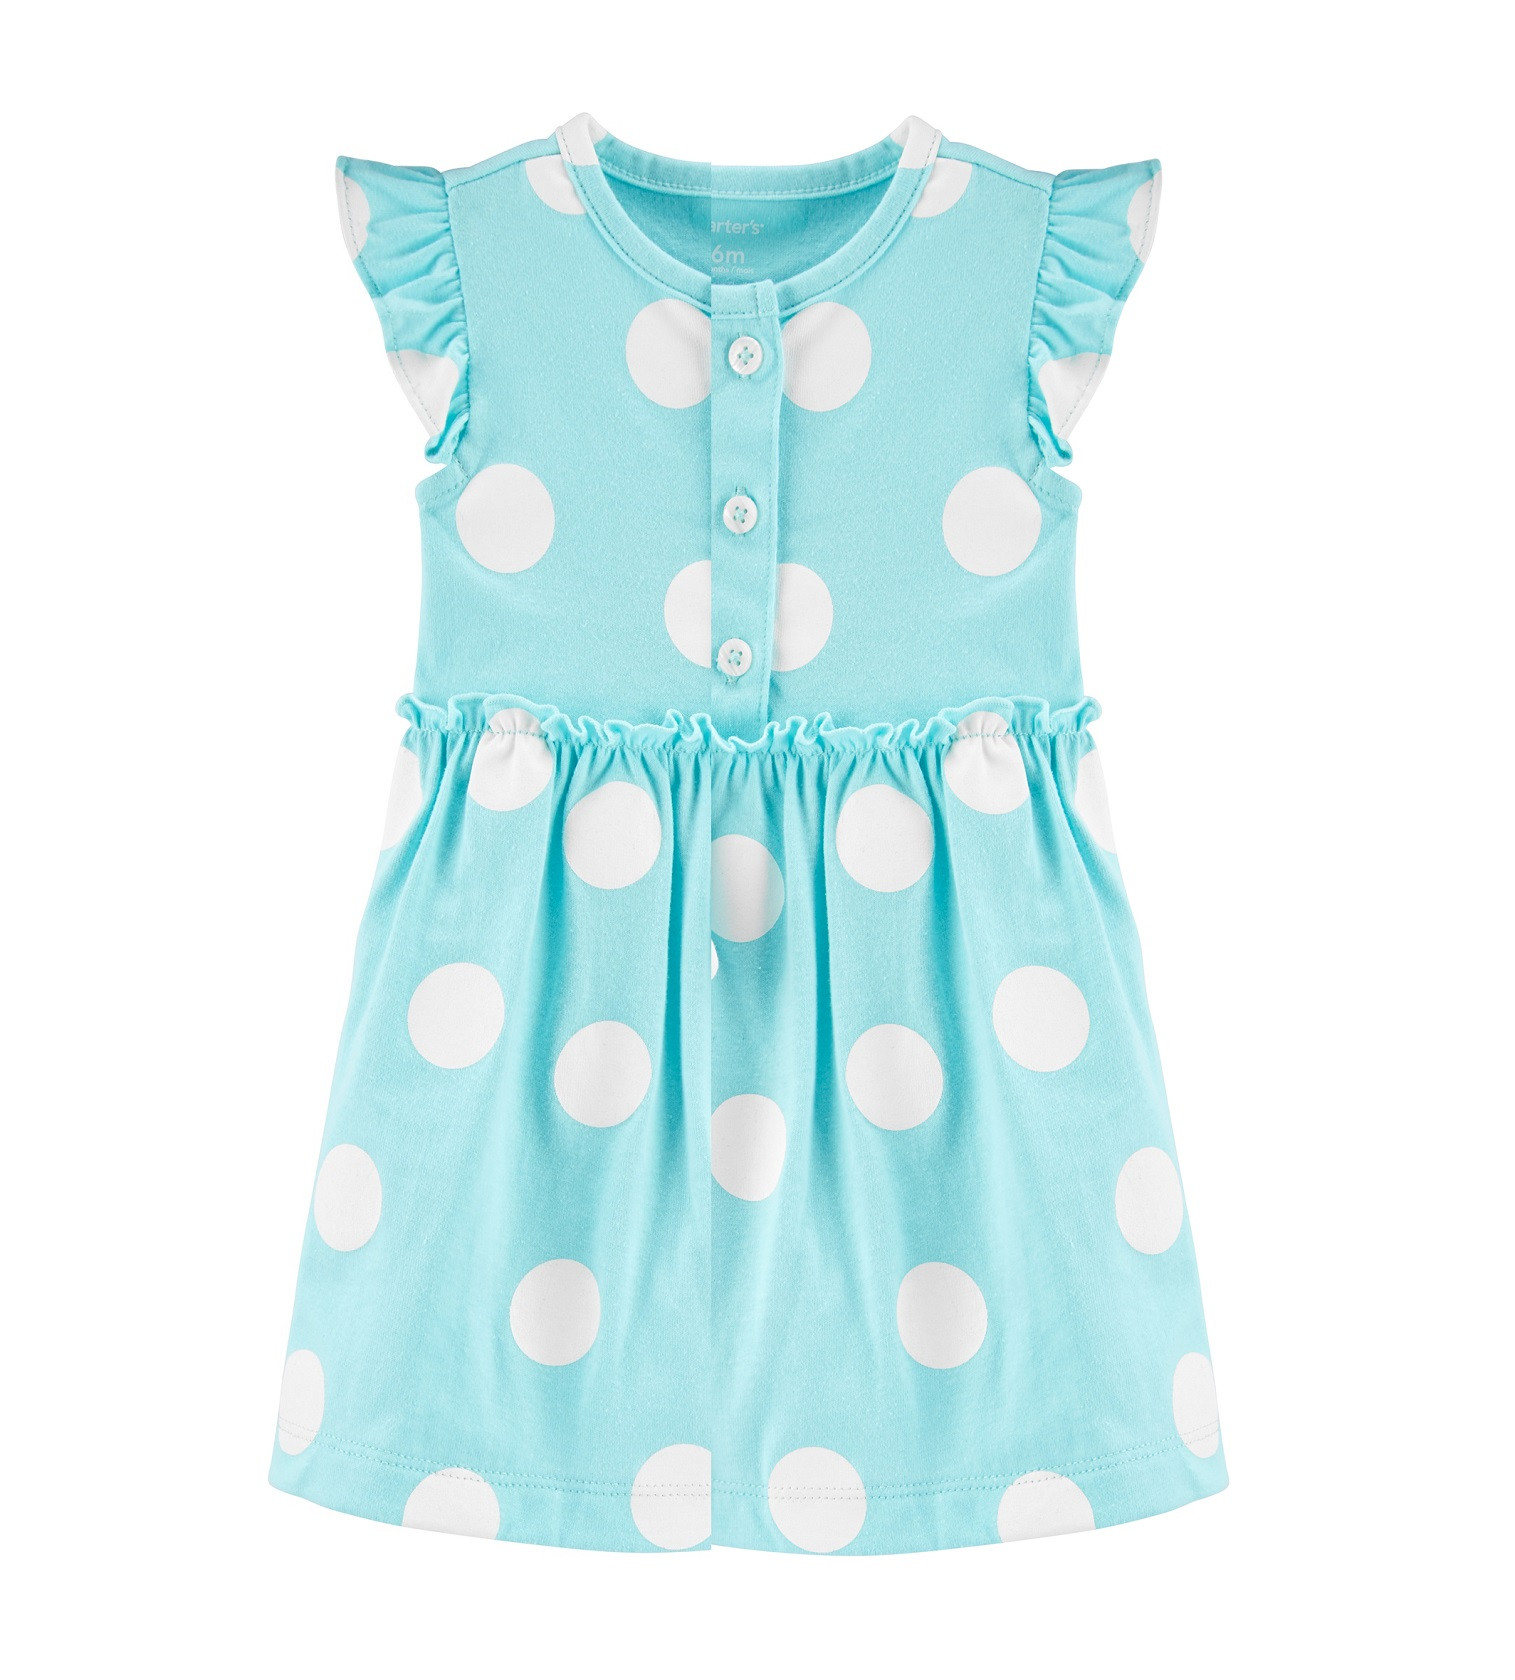 Купити Сукня з трусиками Carters Blue Горошек - фото 1